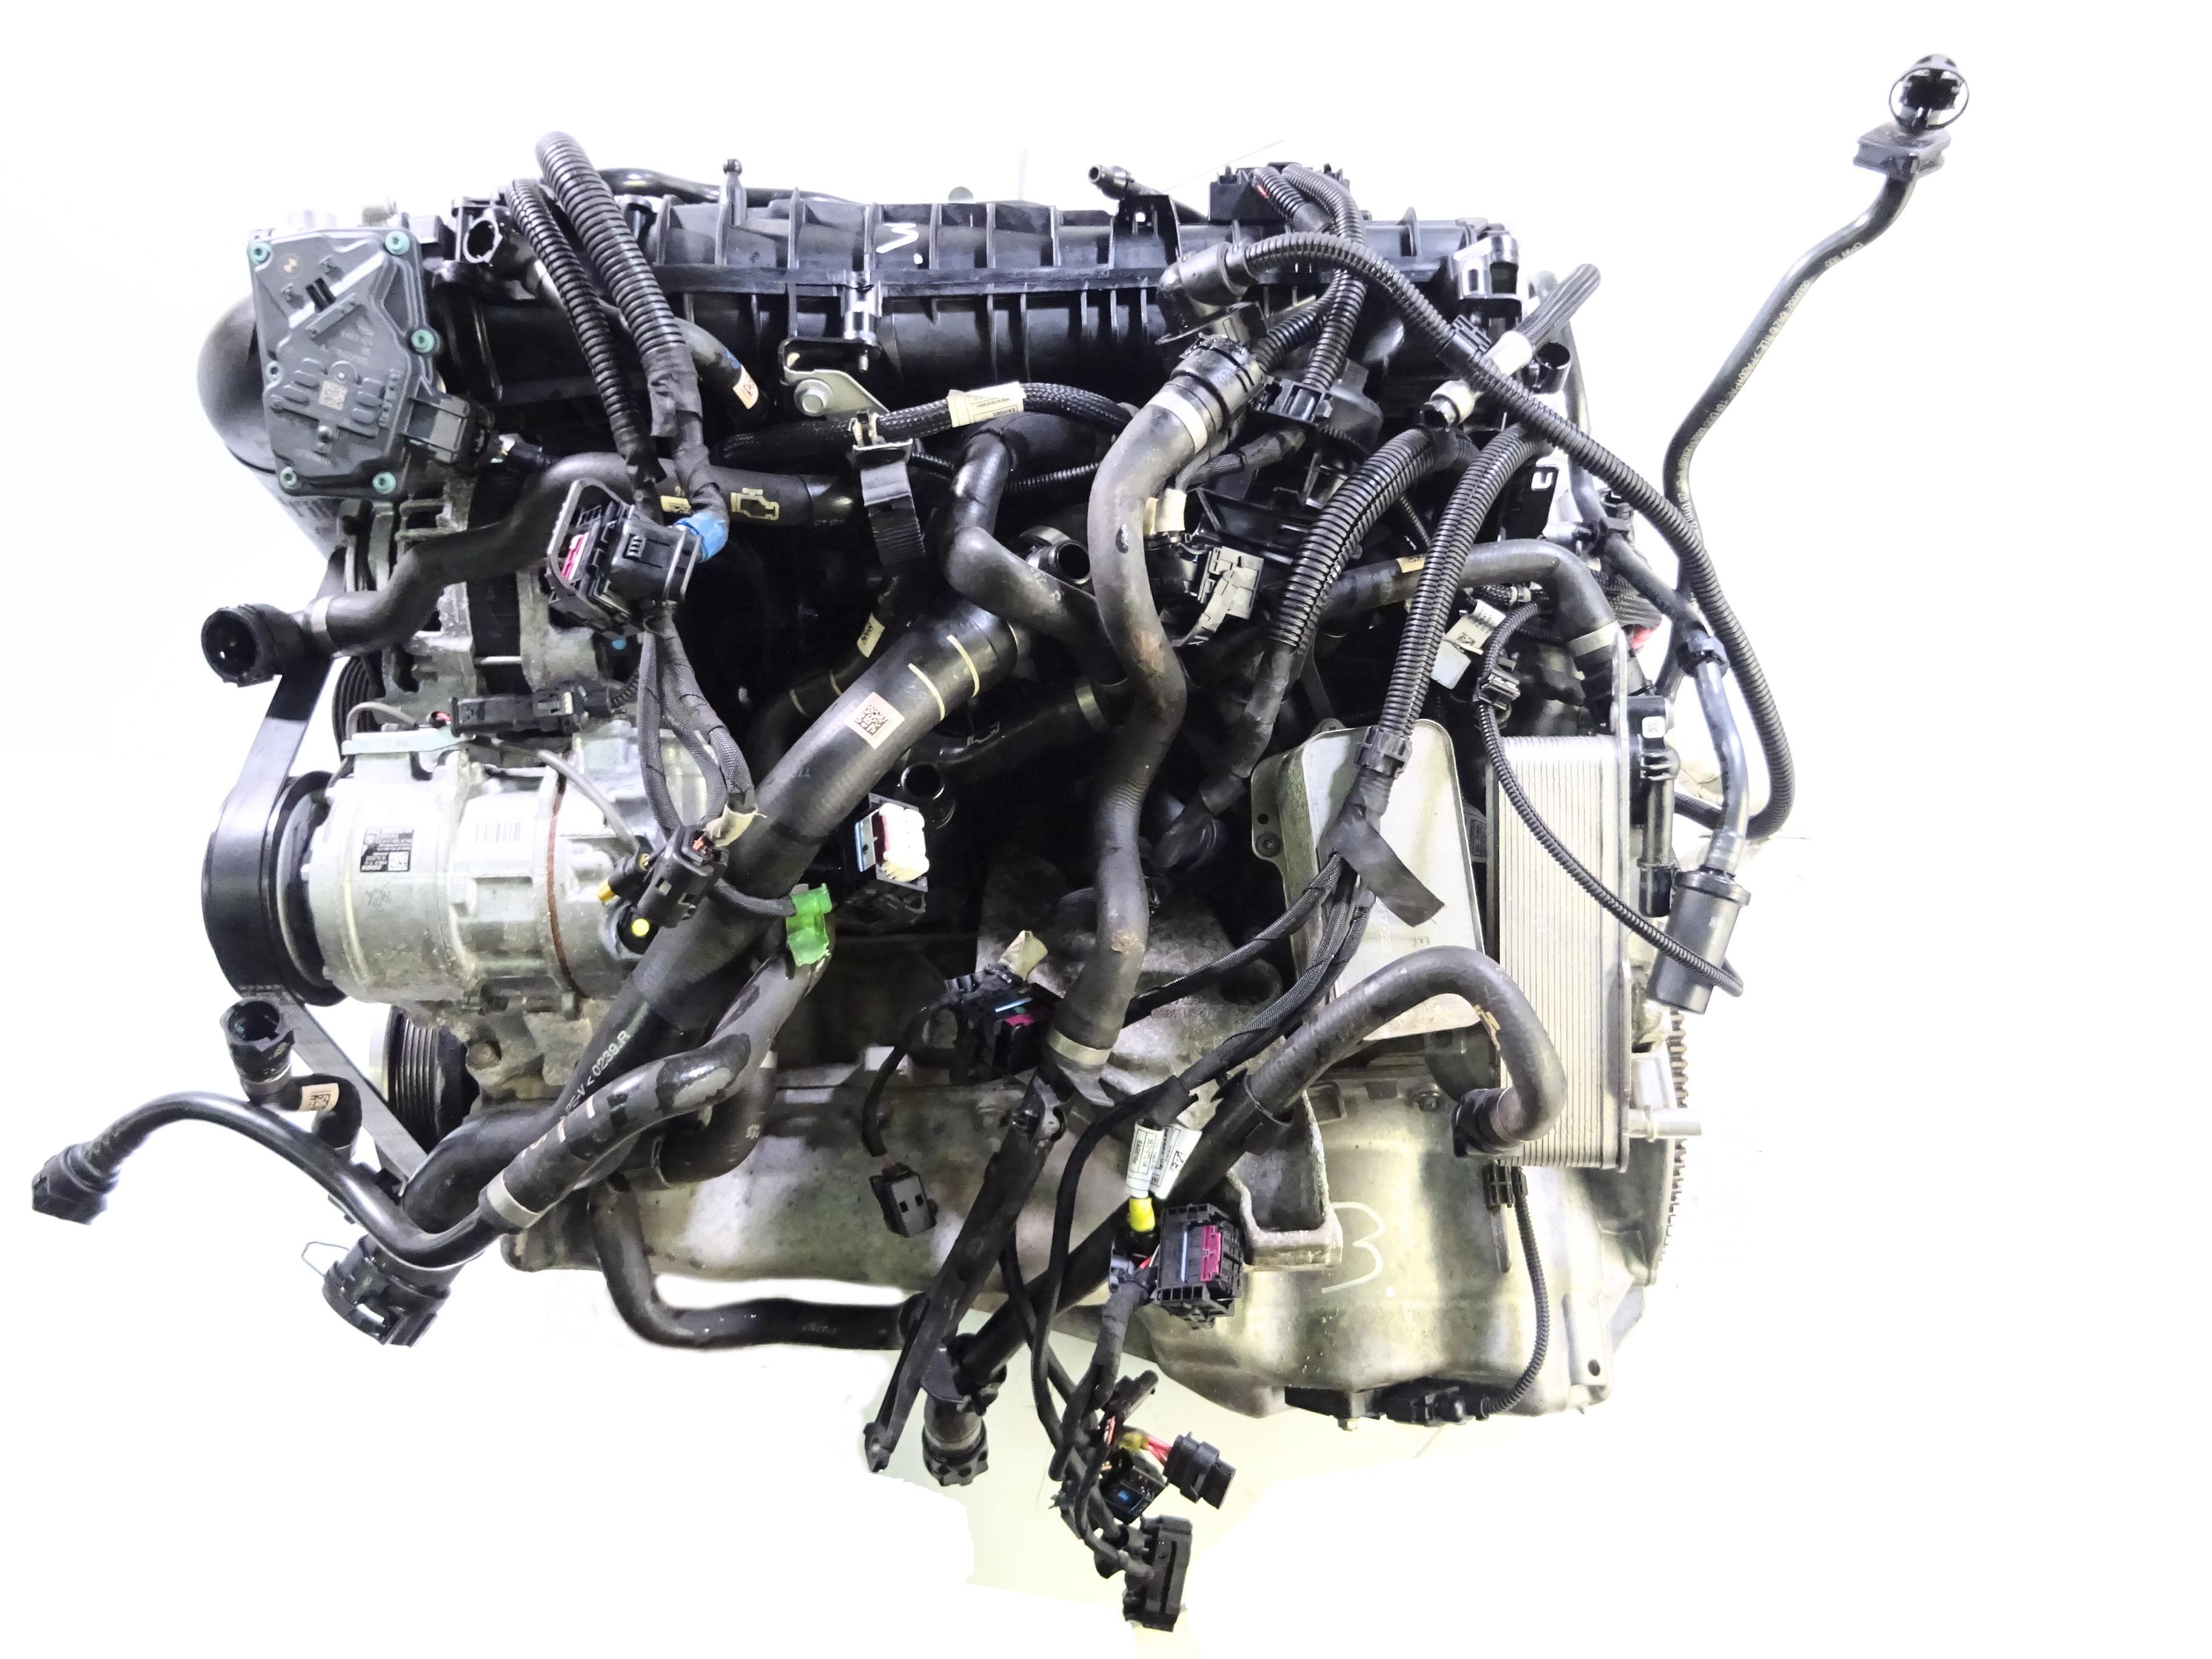 2018 Motor für BMW 1er F20 F21 M1 140i 140 3,0 i Benzin B58 B58B30A 340 PS